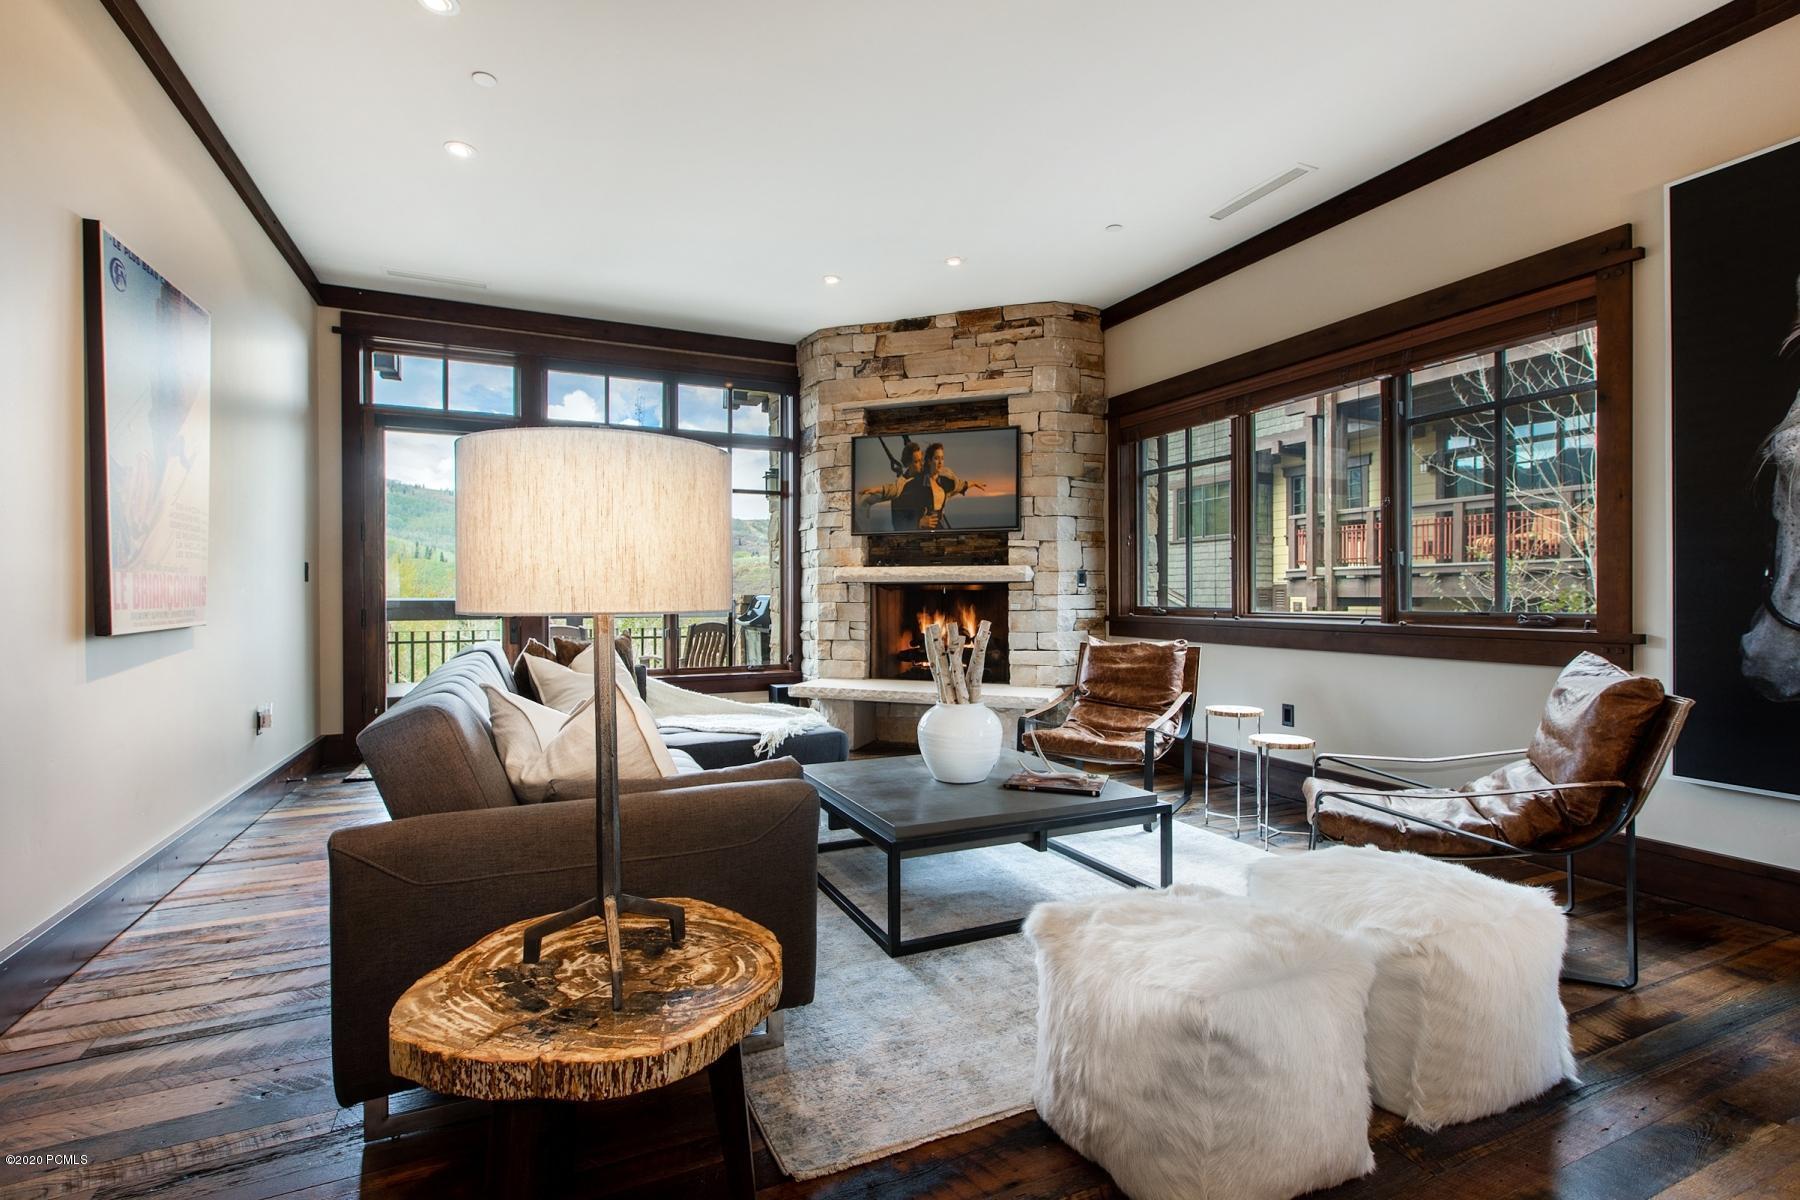 8880 Empire Club Drive, Park City, Utah 84060, 2 Bedrooms Bedrooms, ,3 BathroomsBathrooms,Condominium,For Sale,Empire Club,12003613